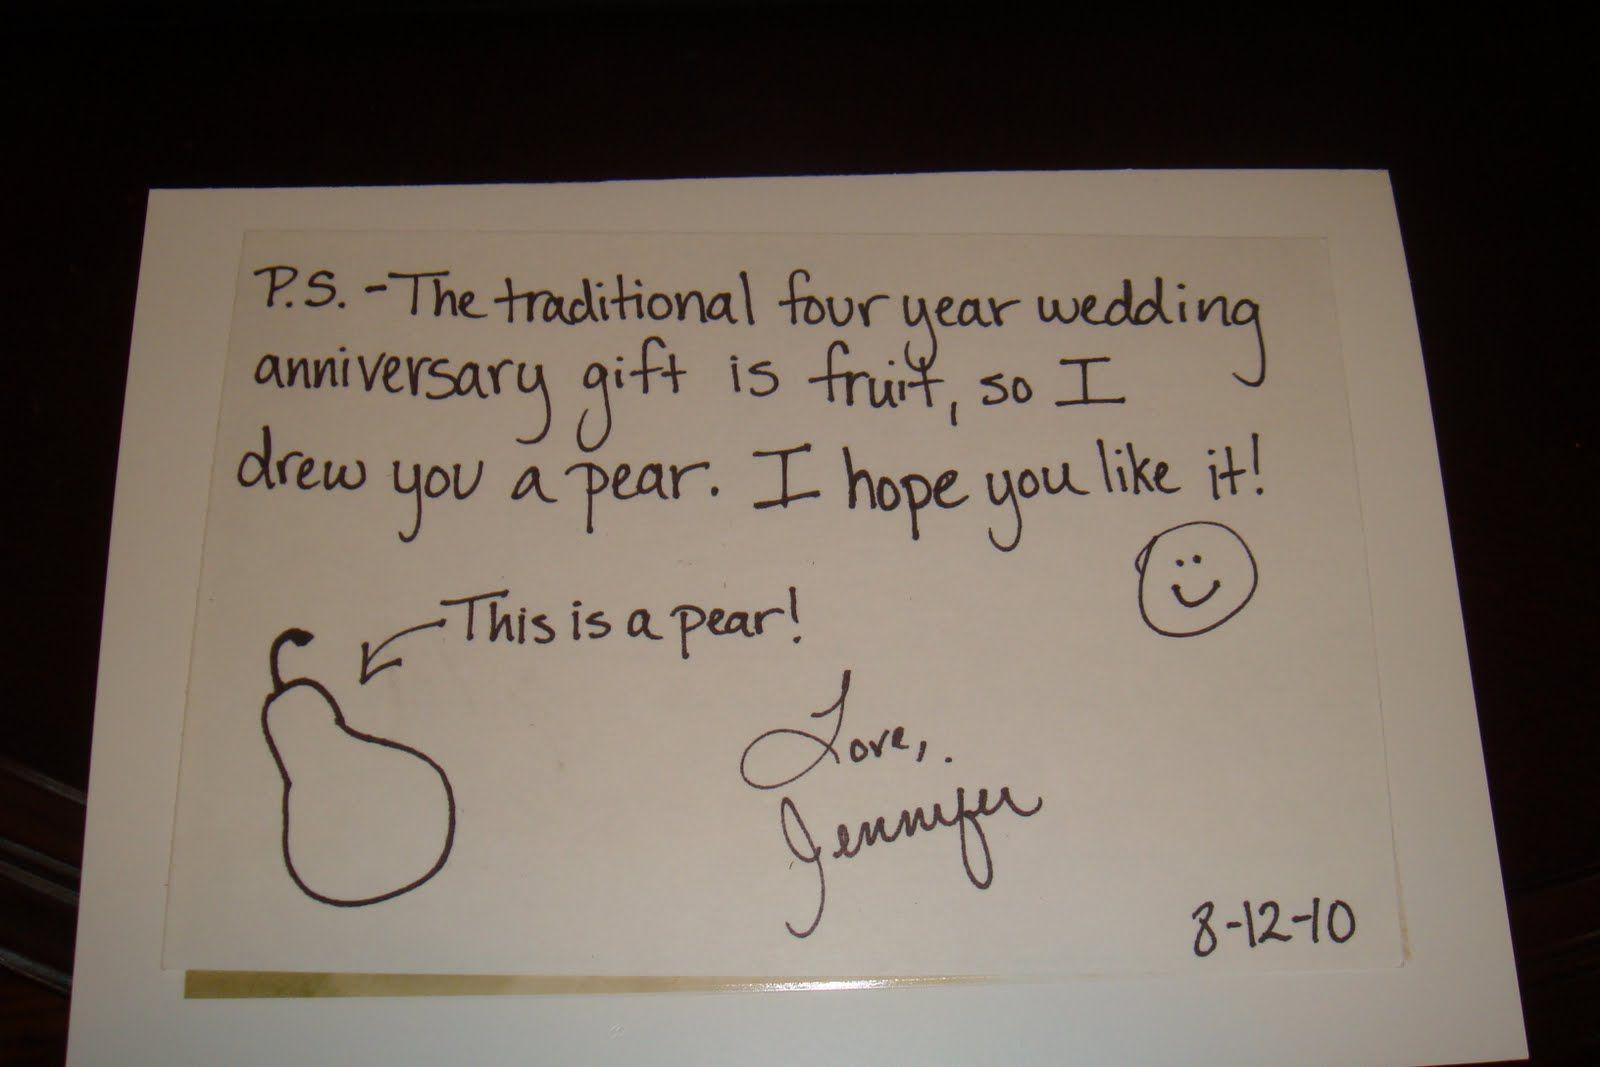 wedding anniversary gift Boyfriend anniversary gifts